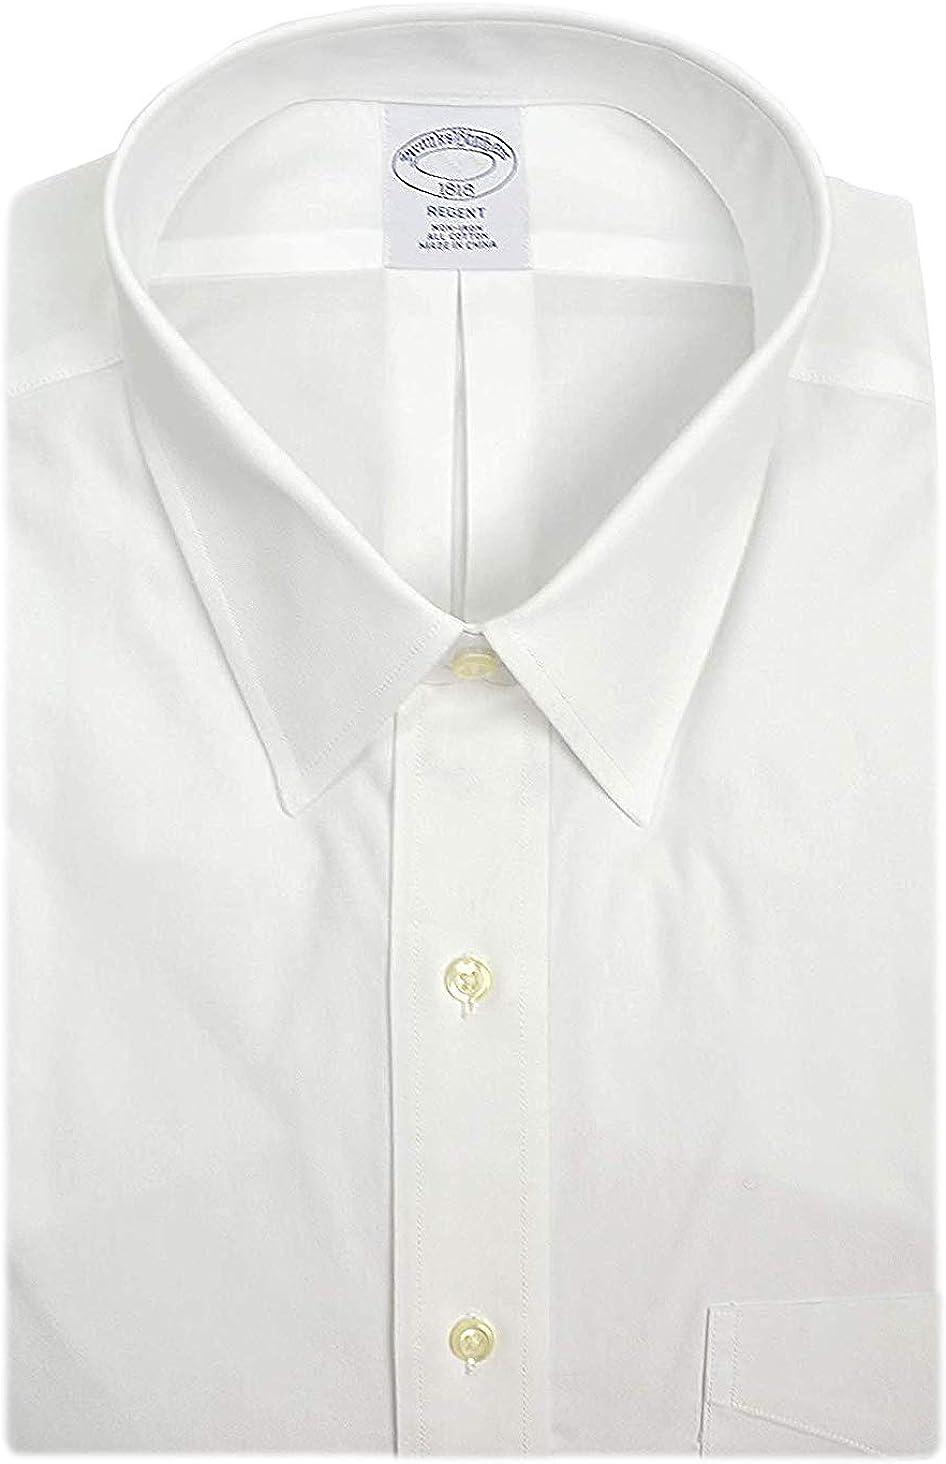 Brooks Brothers Mens Regent Fit Non Iron 100% Cotton Pocket Dress Shirt Bright White